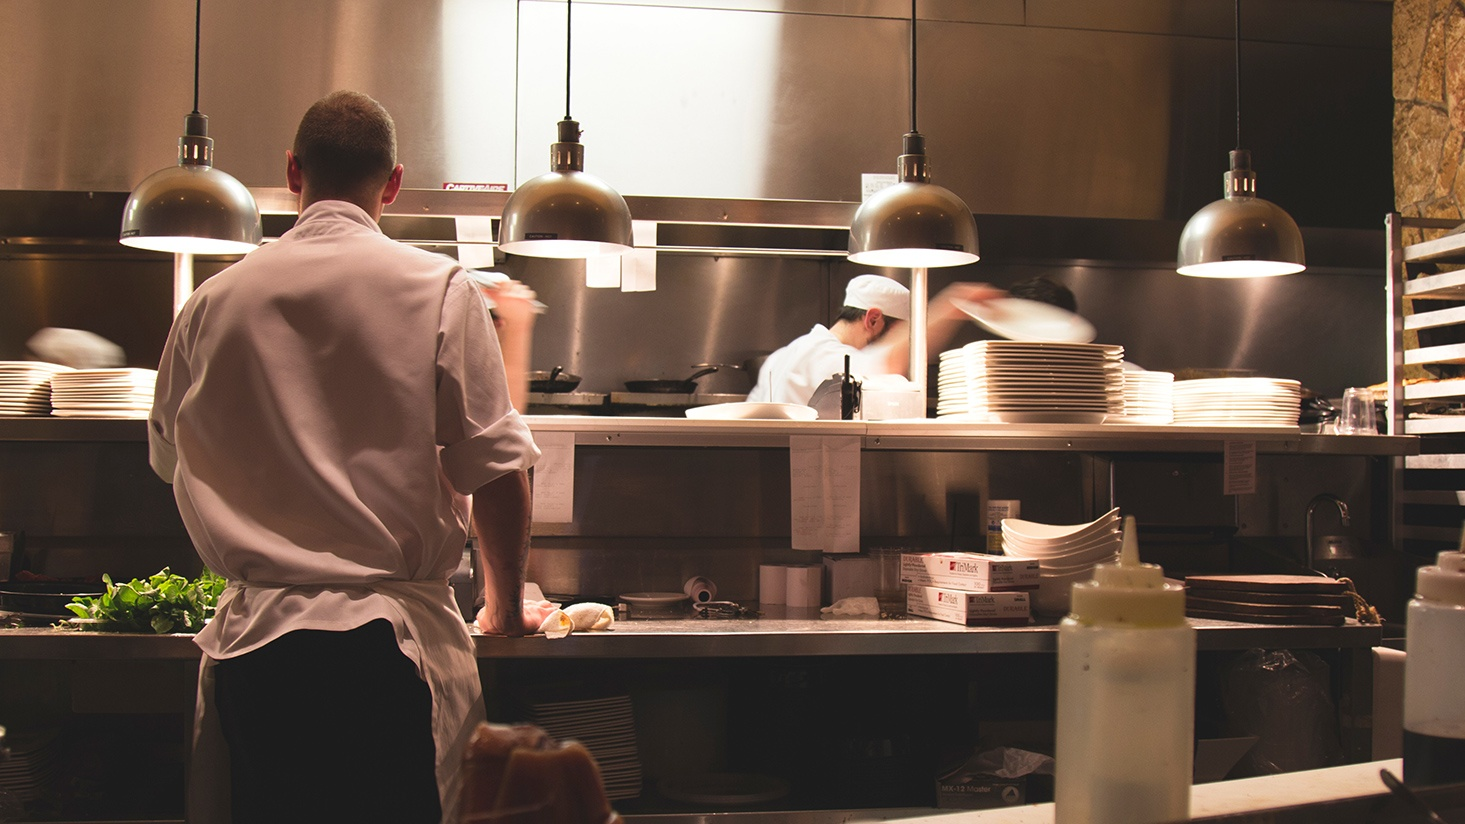 Here's a recipe for restaurant lighting design success